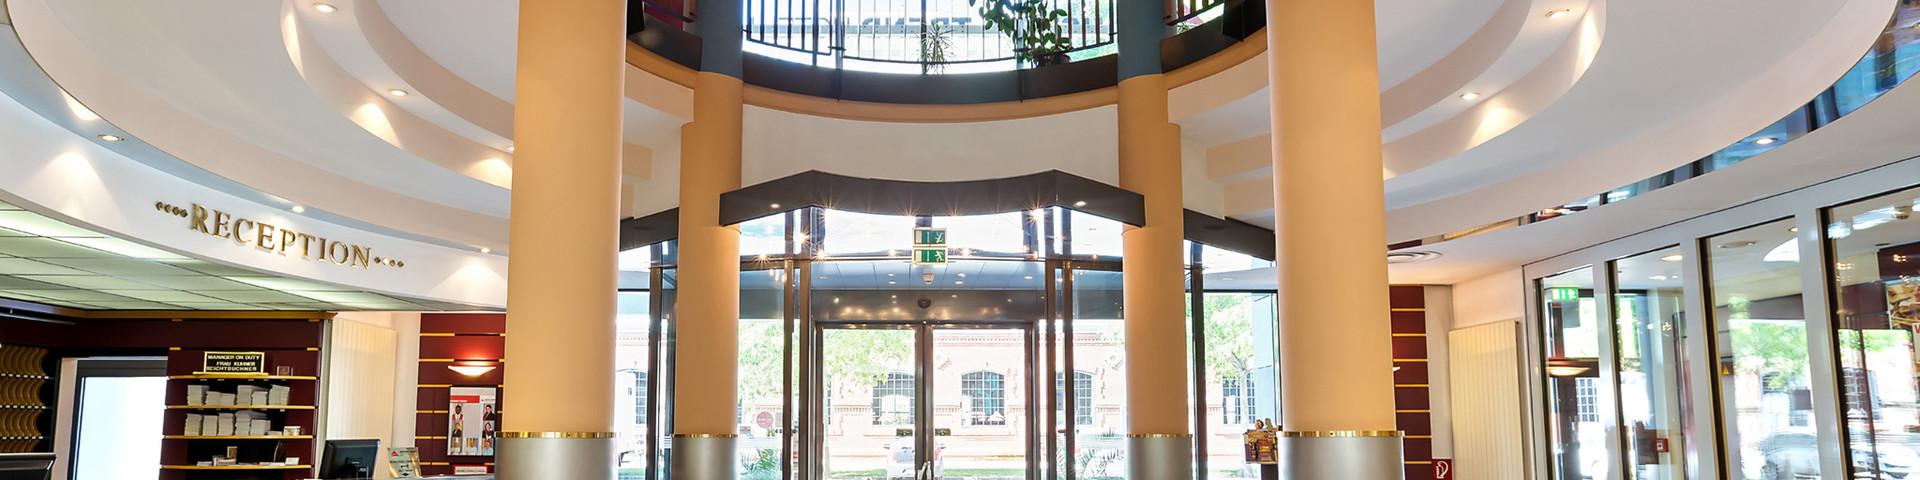 Austria Trend Hotel Lassalle - Lobby © Austria Trend Hotels